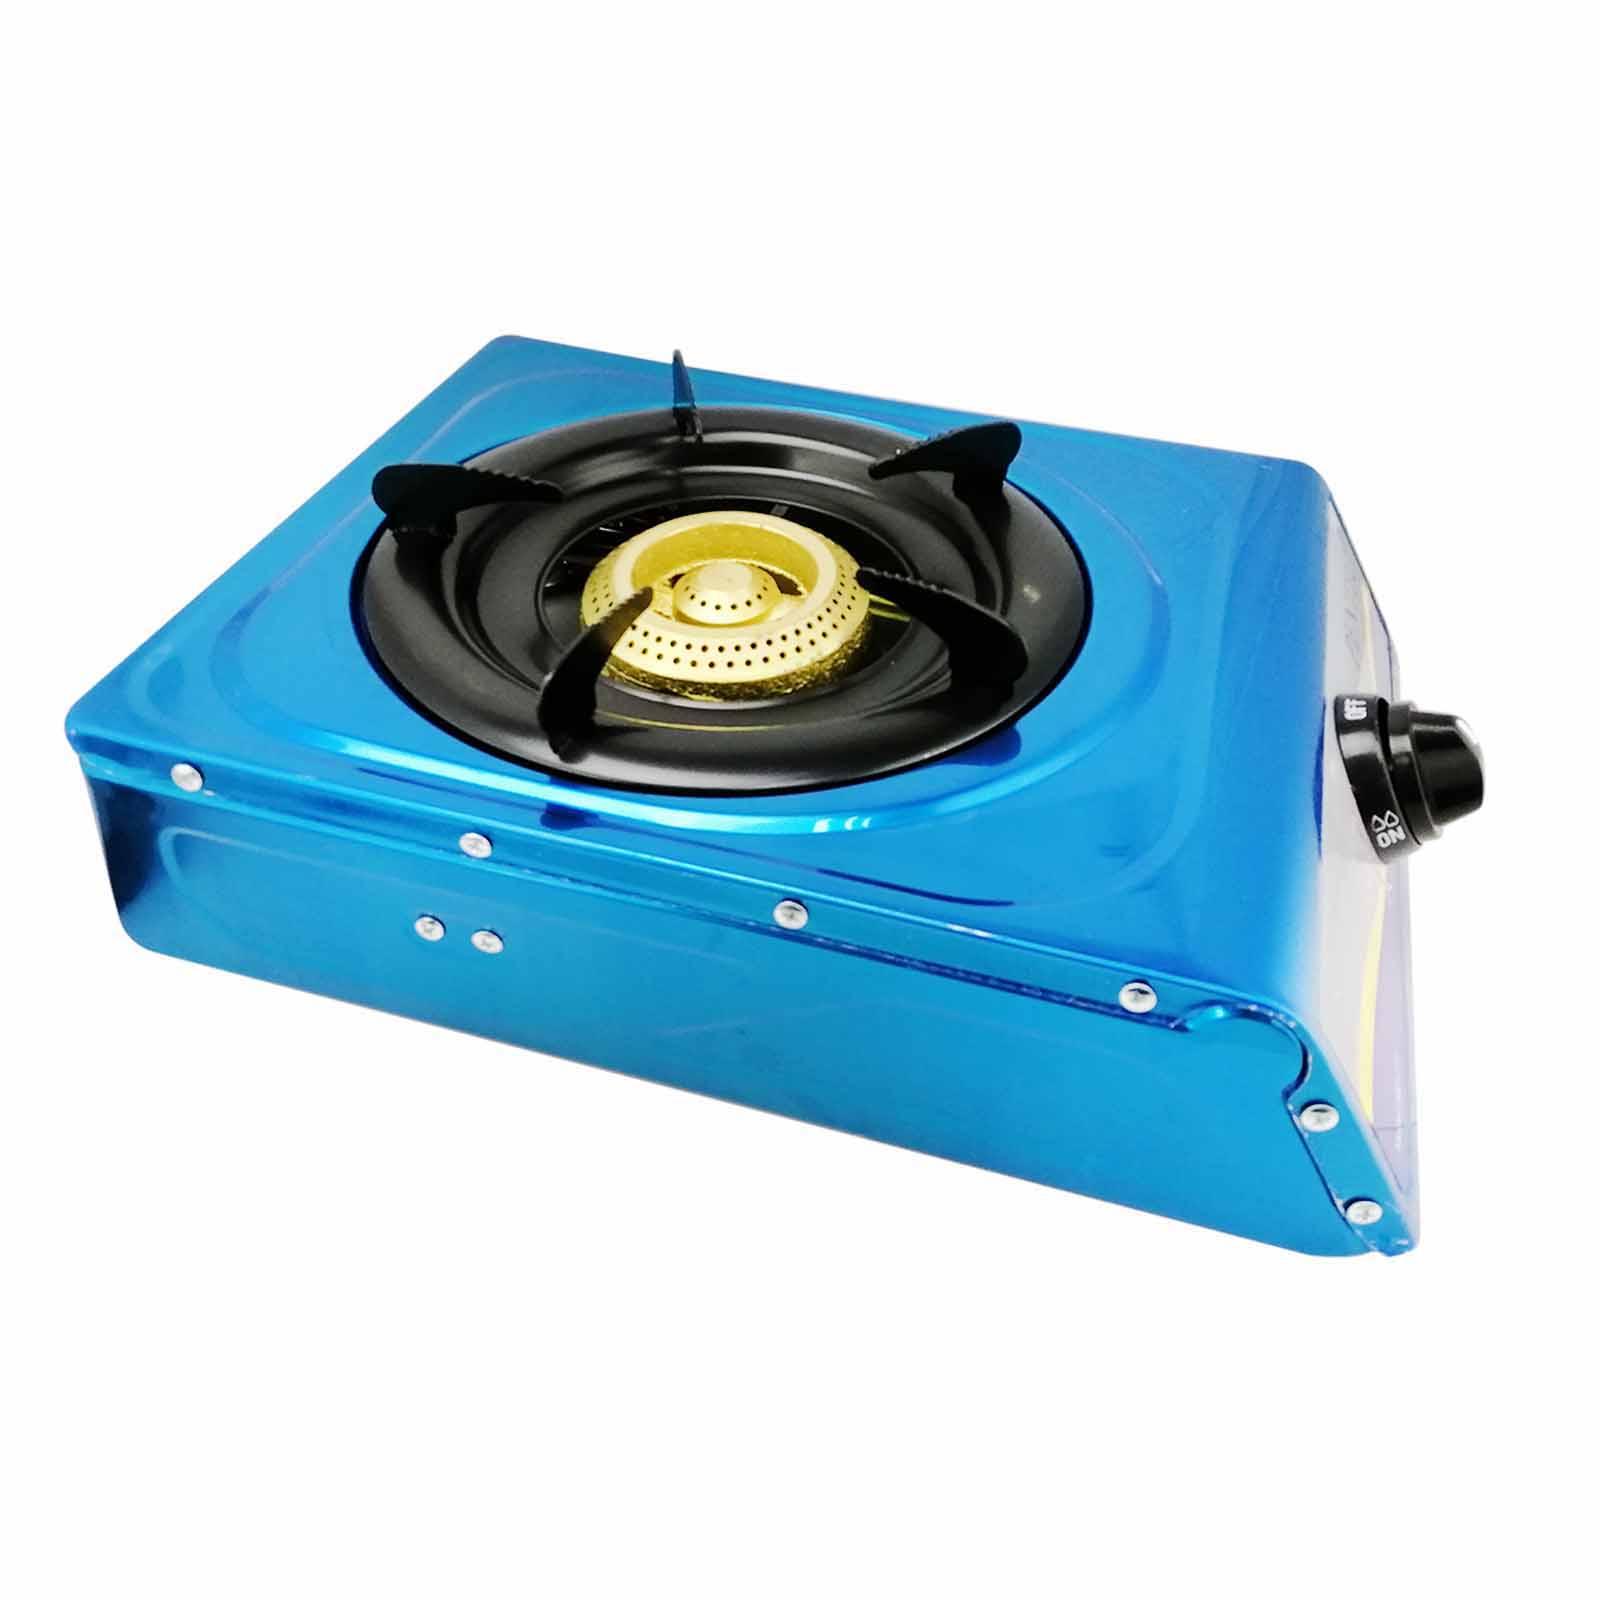 PENTEC Aluminium Gas Stove ST-65 Home Use Cook High Efficiency Burning Premium Single